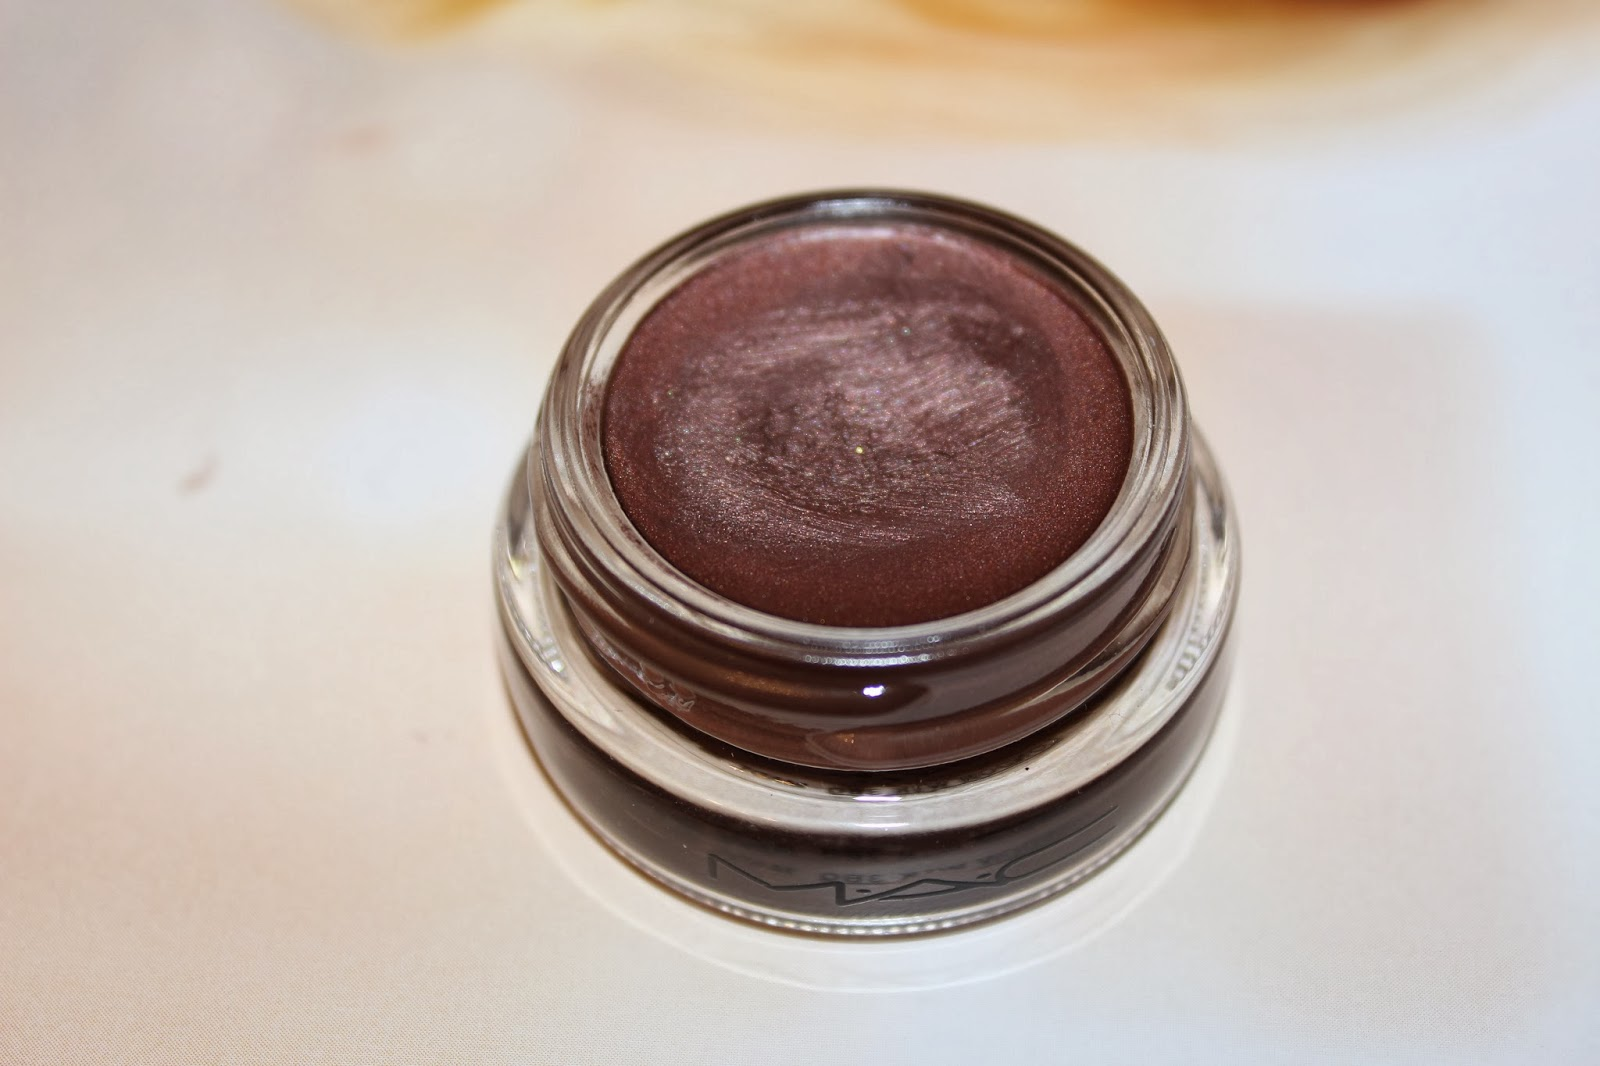 Mac pro longwear paint pot in constructivist mybeautysleuth for Mac pro longwear paint pot painterly